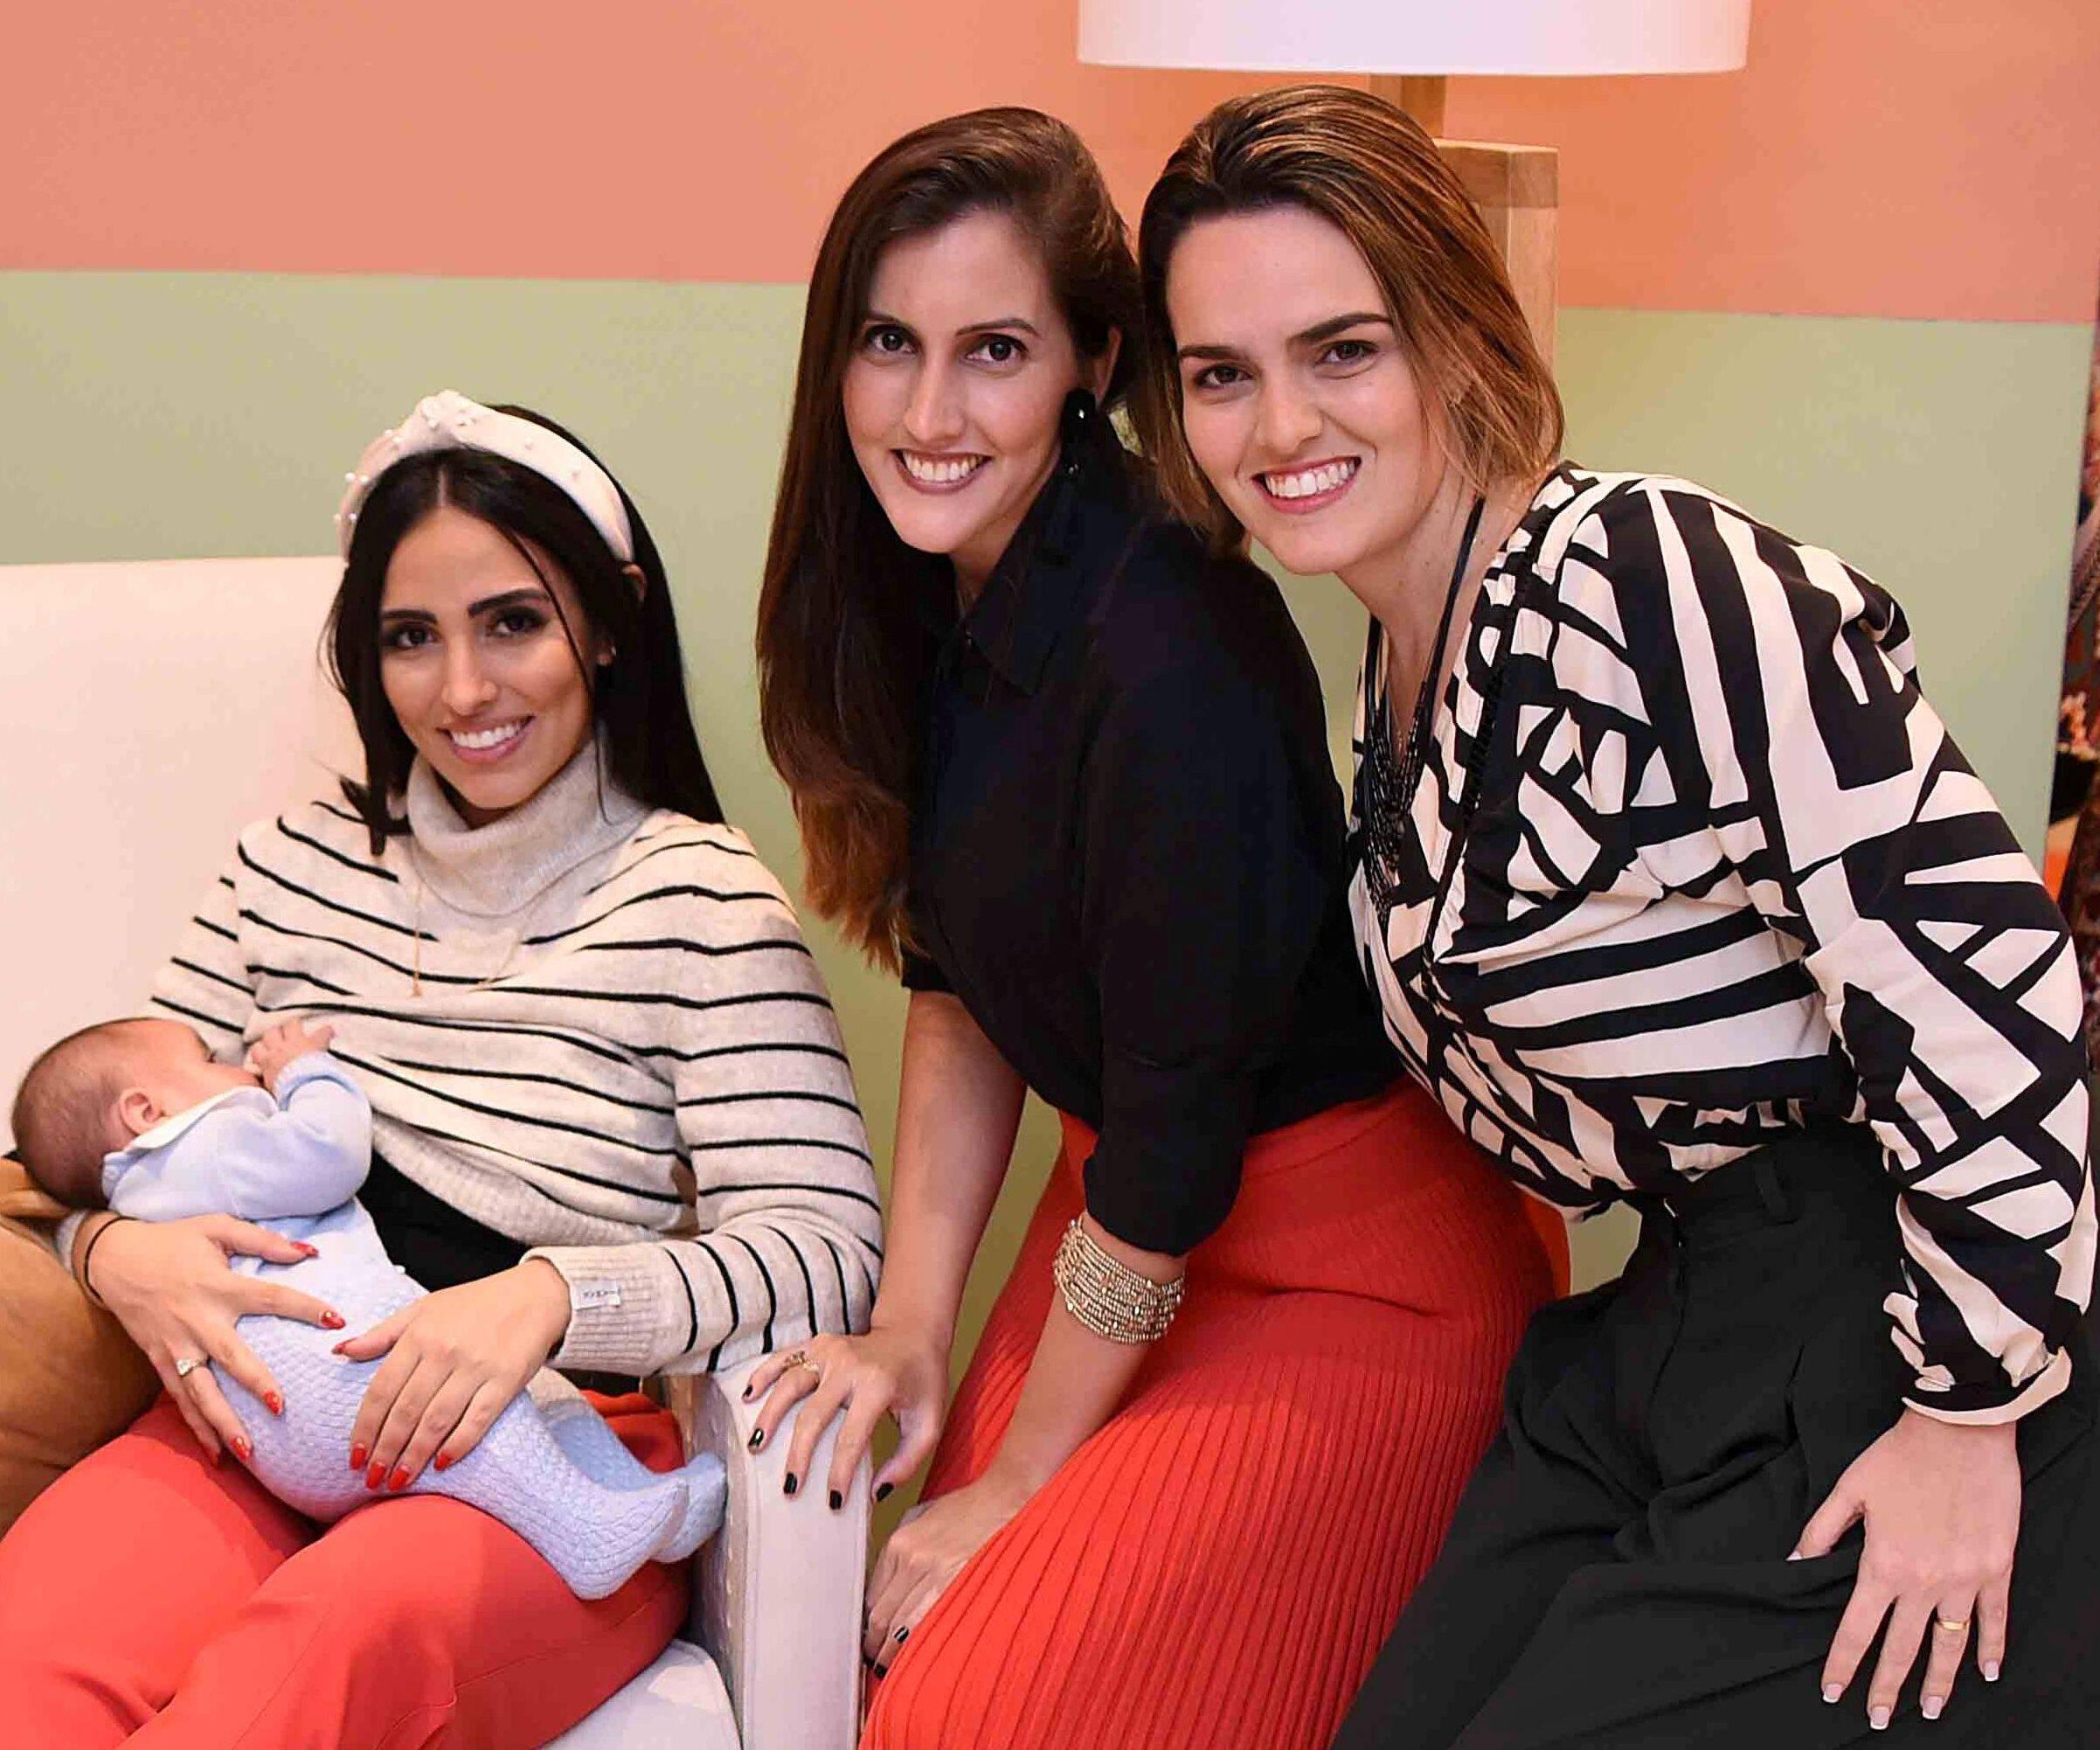 Zion com a Mãe Jade Sebba, Luana Bombiere e Dafne Sampaio /Foto: Ari Kaye